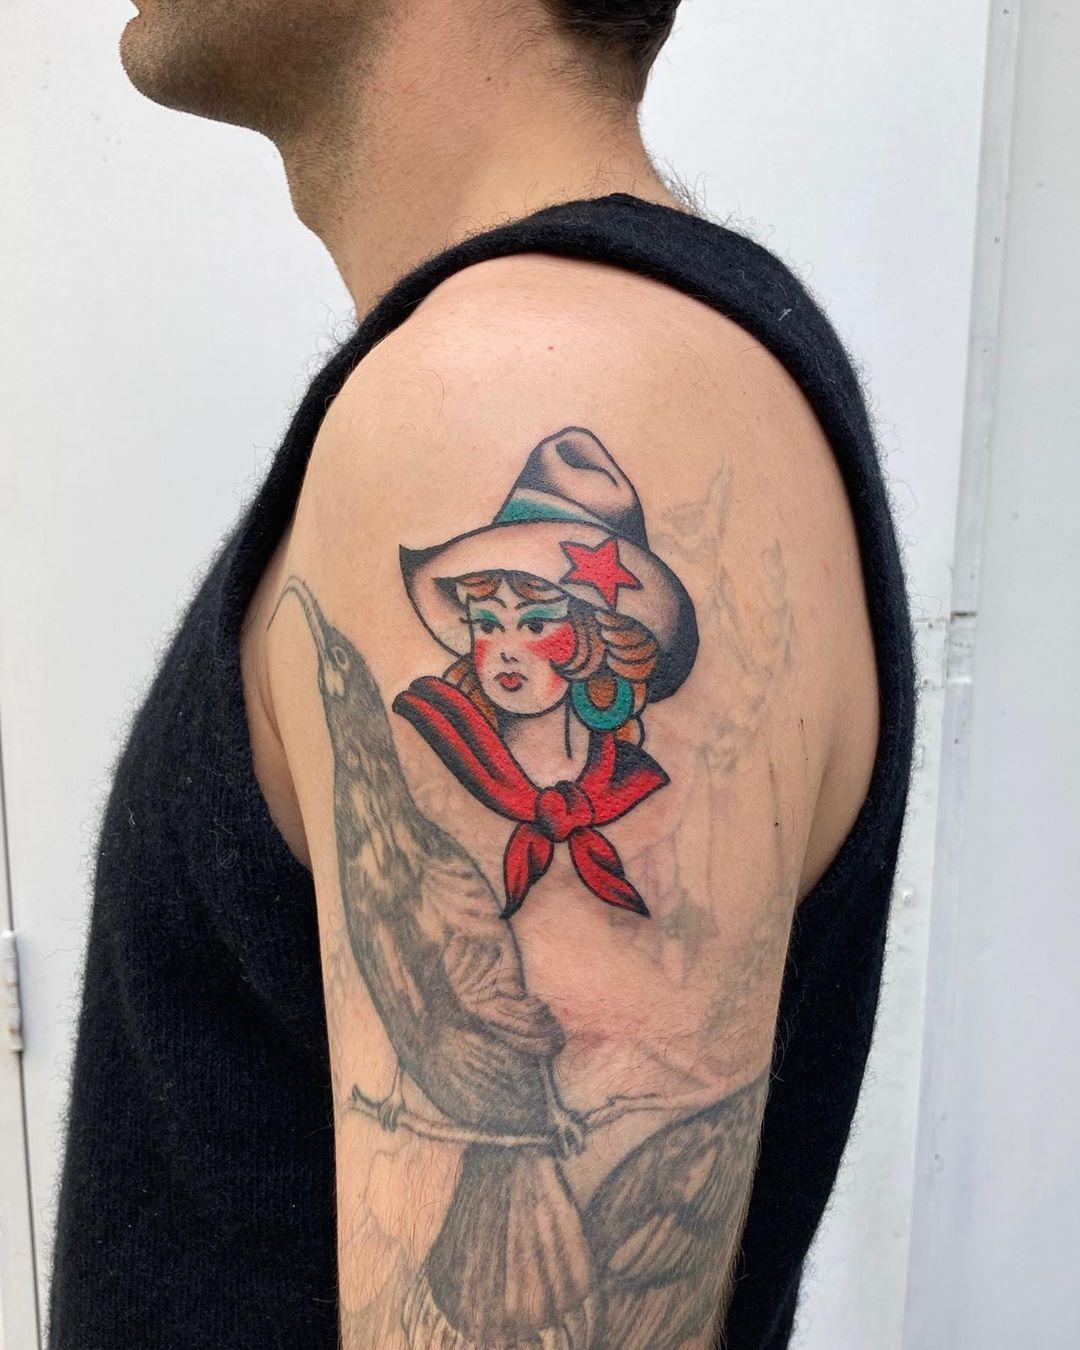 Milton Zeis Cowgirl for Joe! Thanks again @morrisjona !!! I've got time to tattoo next week, dm/email to book in! . . . . #tattoo #tattoos #traditional #traditionaltattoo #traditionaltattoos #trad #tradtattoo #tradtattoos #tradtattoos_rtw #americantraditional #americantraditionaltattoos #tradwork #tradworkers #tradworkerssubmission #tradworker #colourwork #colour #colourpop #oldlines #oldschool #oldschooltattoos #wellington #wellingtontattoo #wellingtontattoos